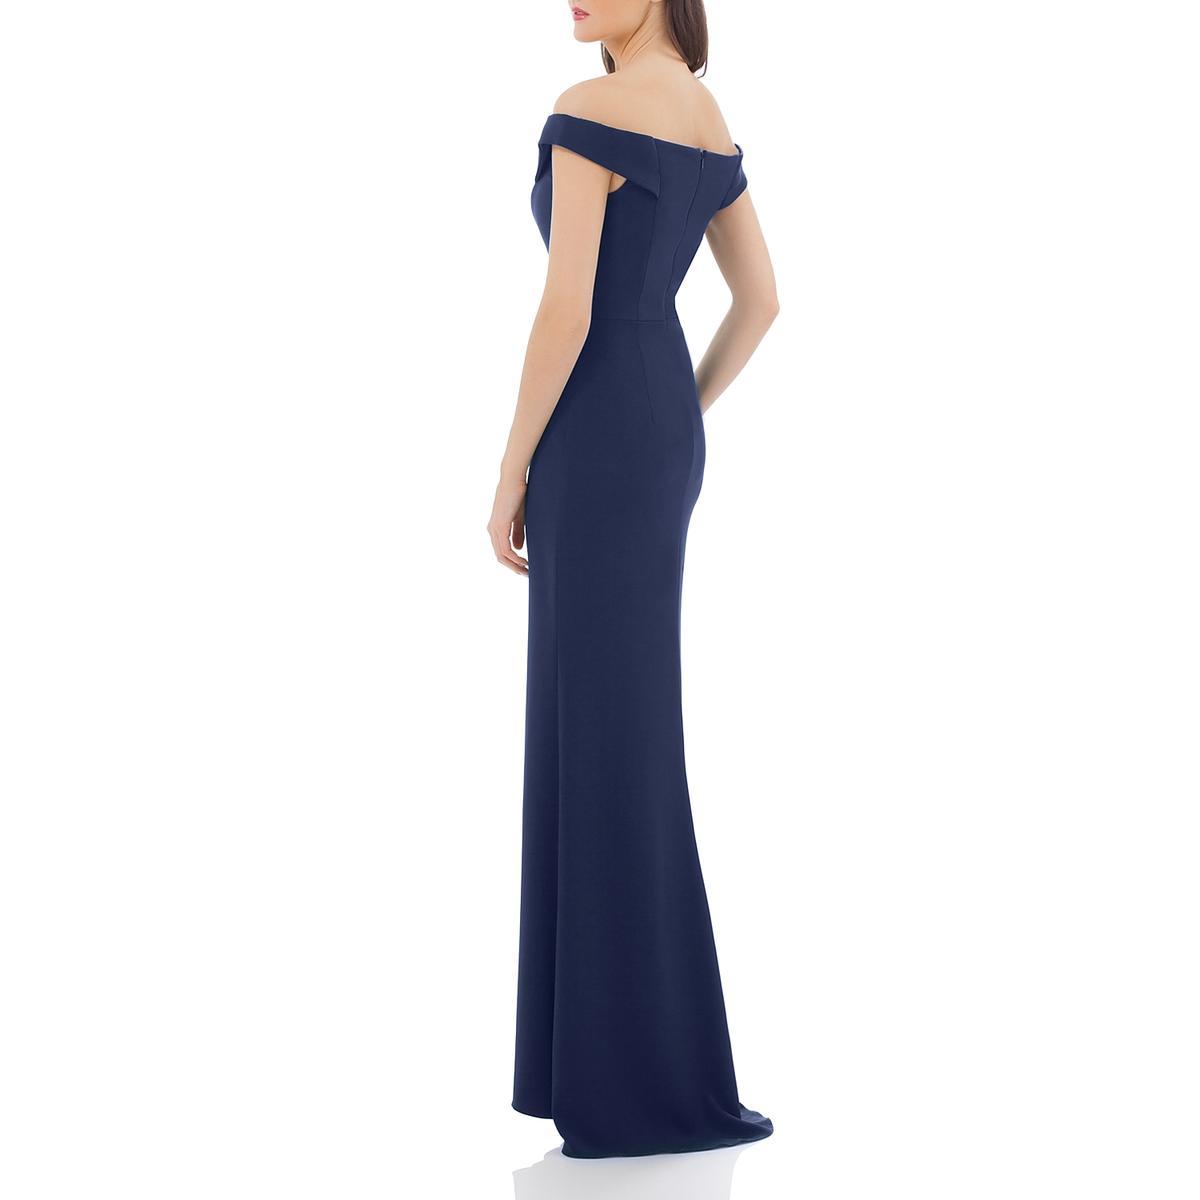 Carmen Marc Valvo Womens Off-The-Shoulder Sheath Evening Dress Gown BHFO 3432